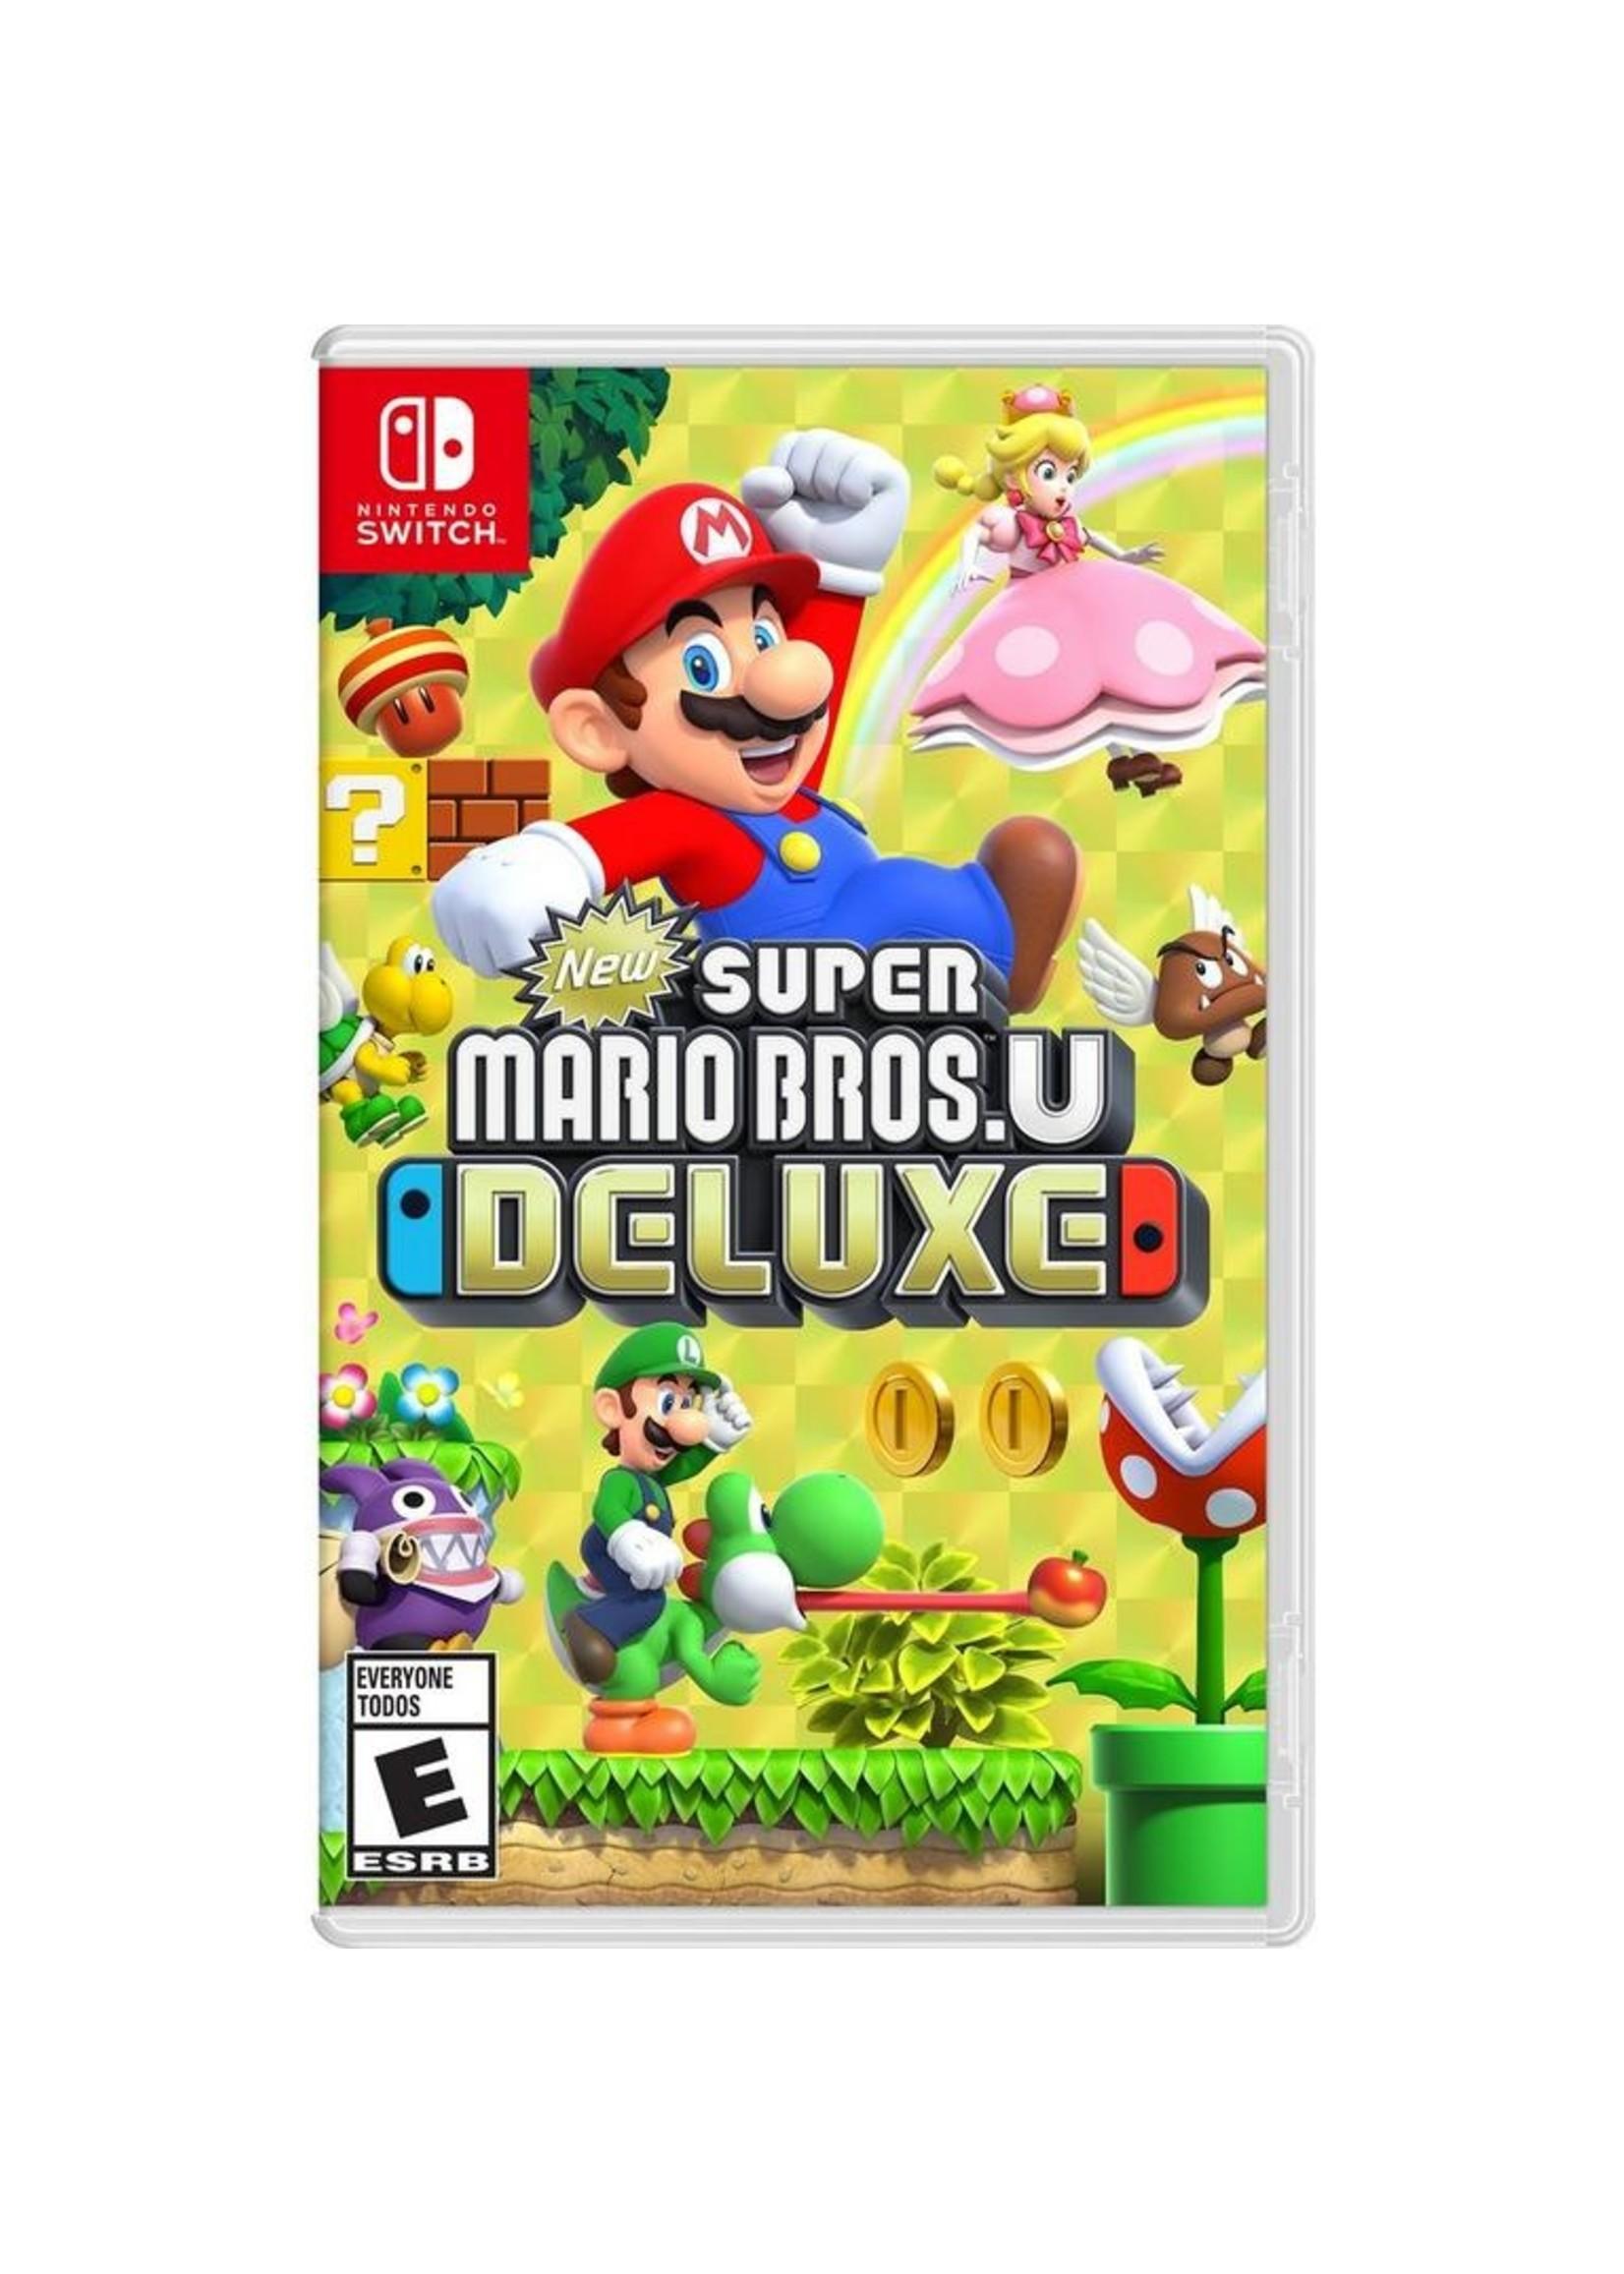 NEW Super Mario Bros. U DELUXE - SWITCH PrePlayed